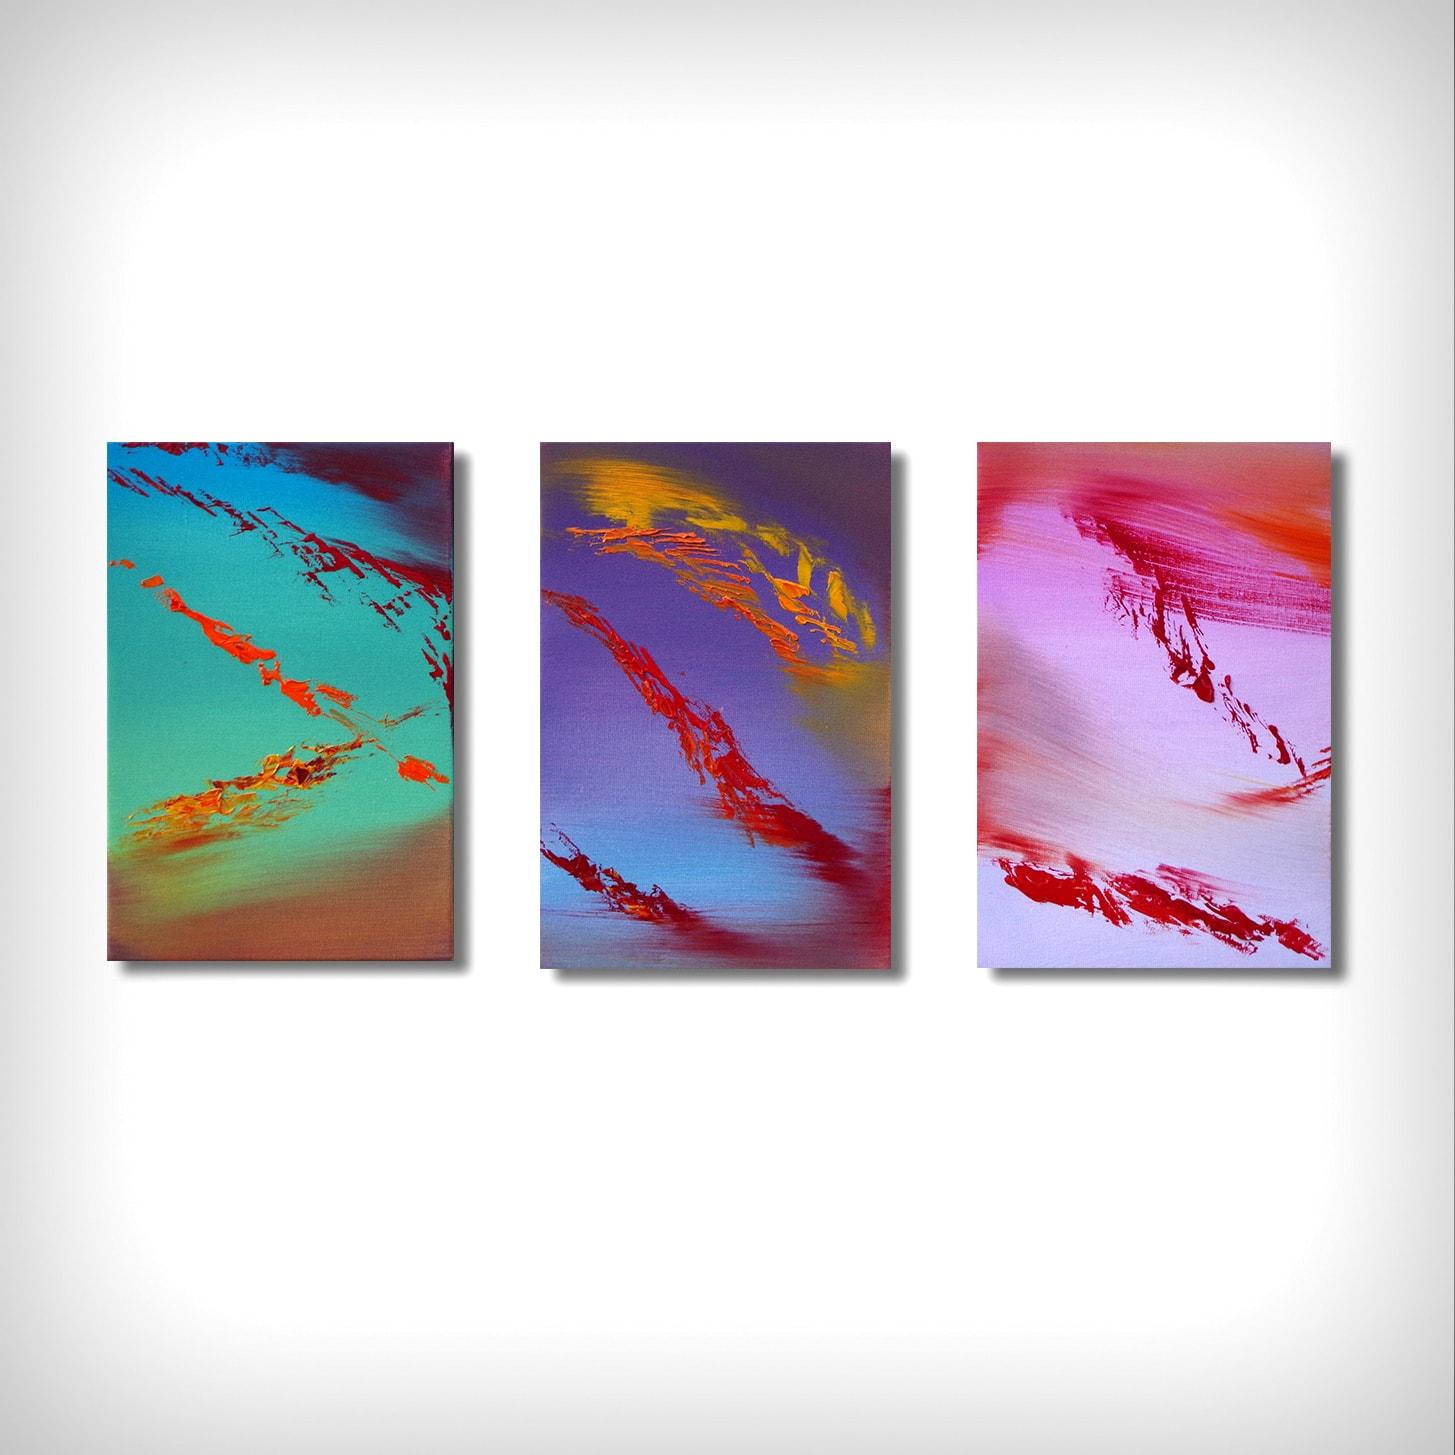 Renaissance triptych dipinto originale in vendita online